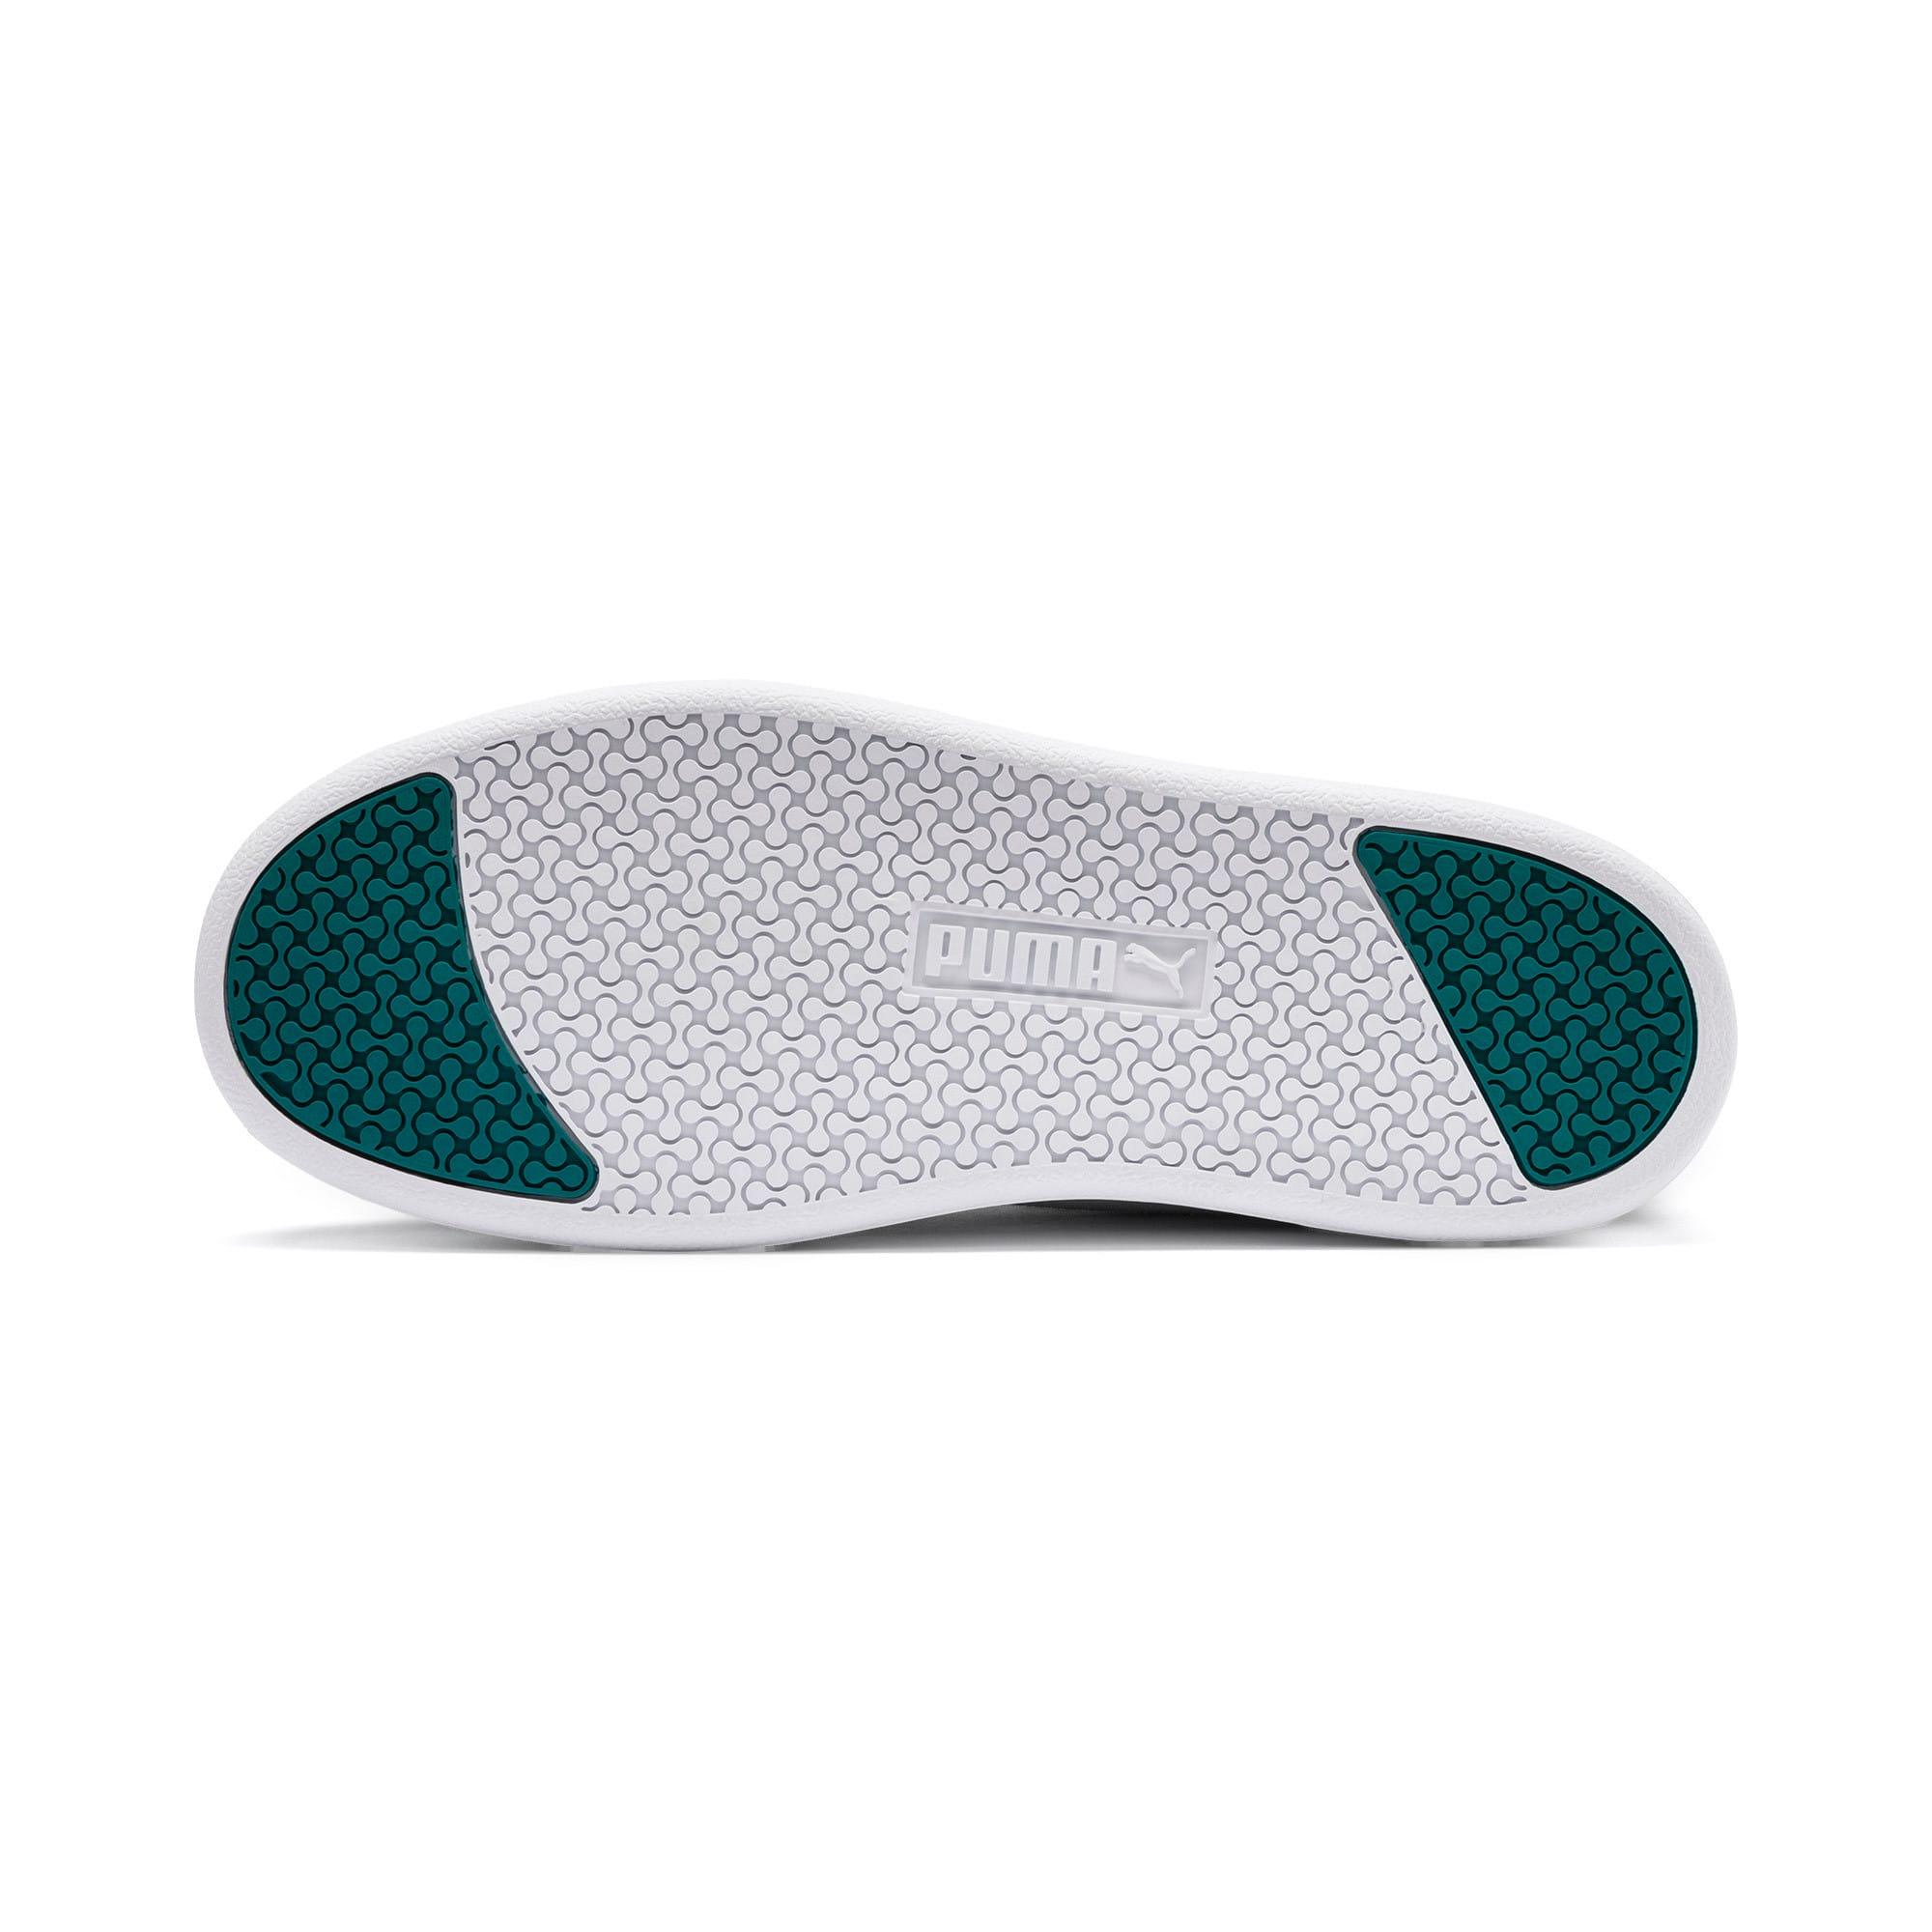 Thumbnail 6 of Puma Smash Platform Women's Shoes, Black-White-T Green-C Coral, medium-IND